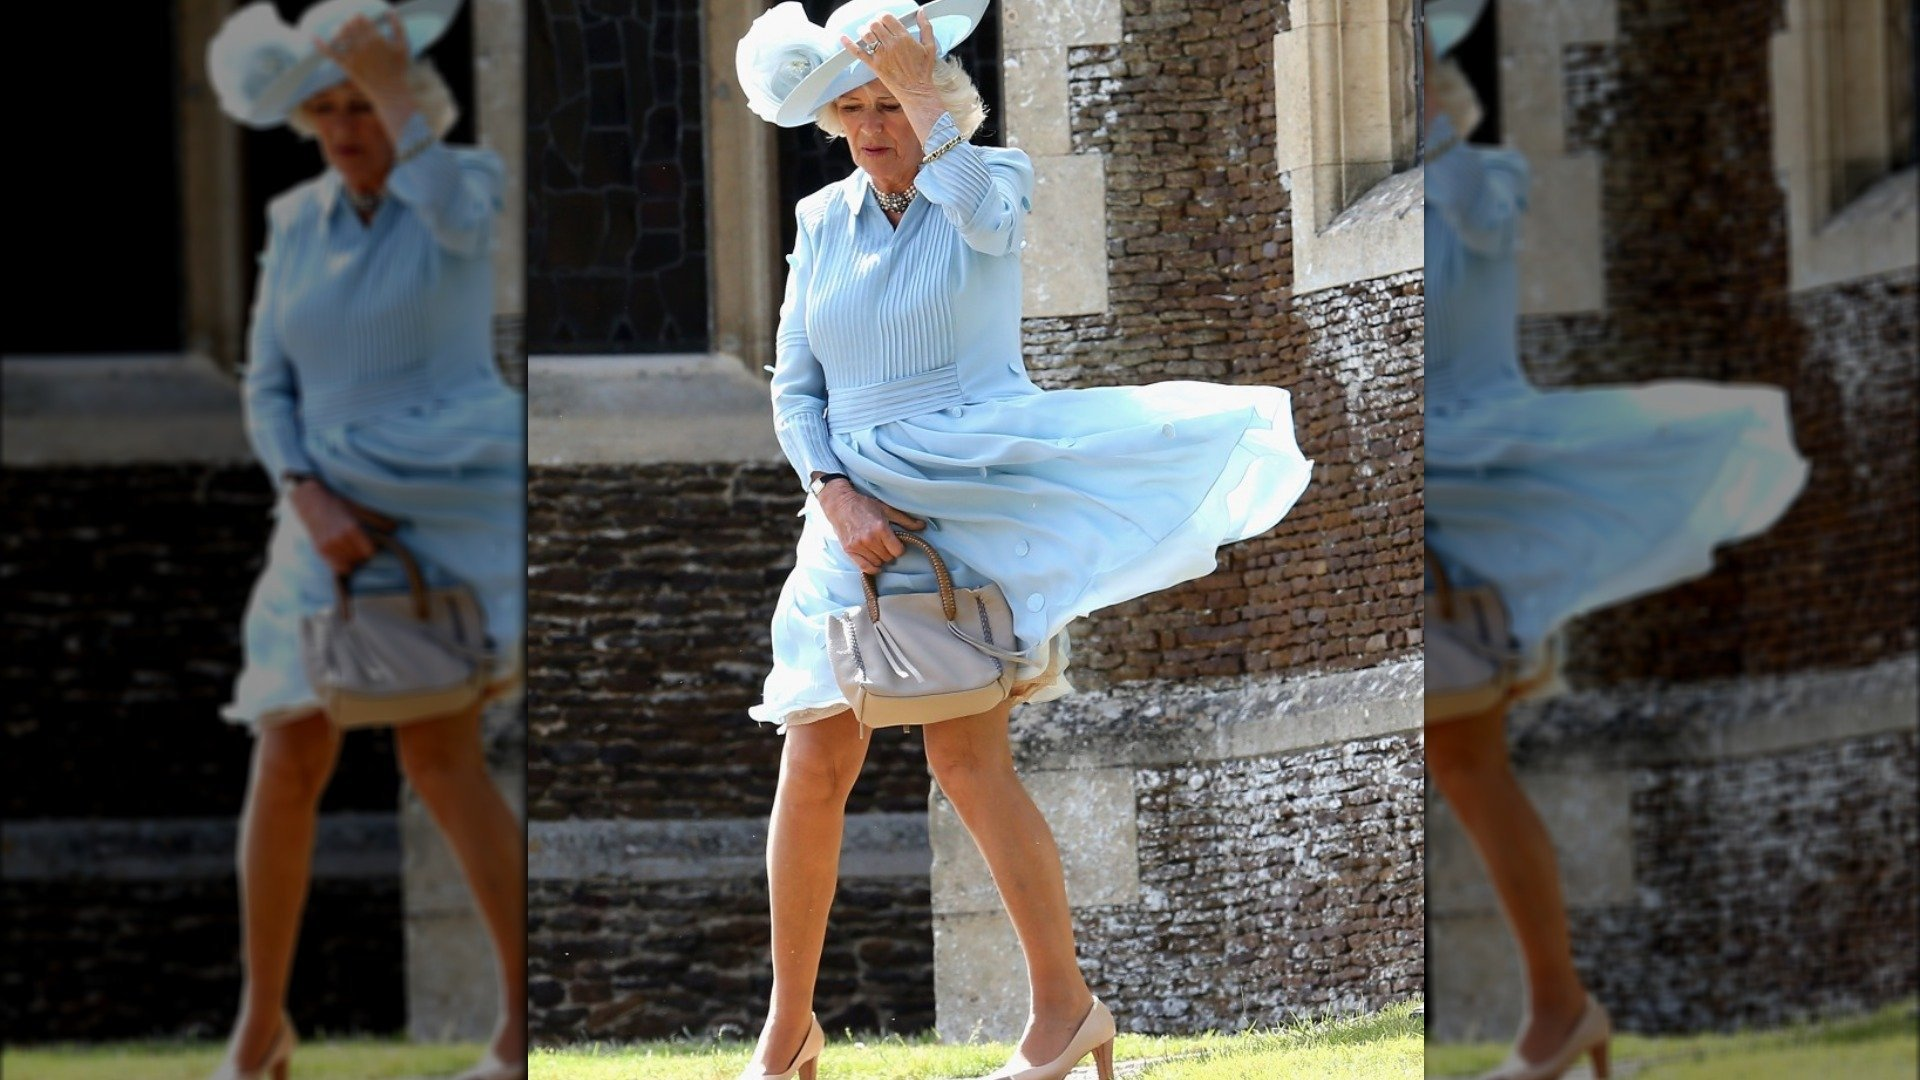 Royal Wardrobe Malfunctions That Had The World Cracking Up